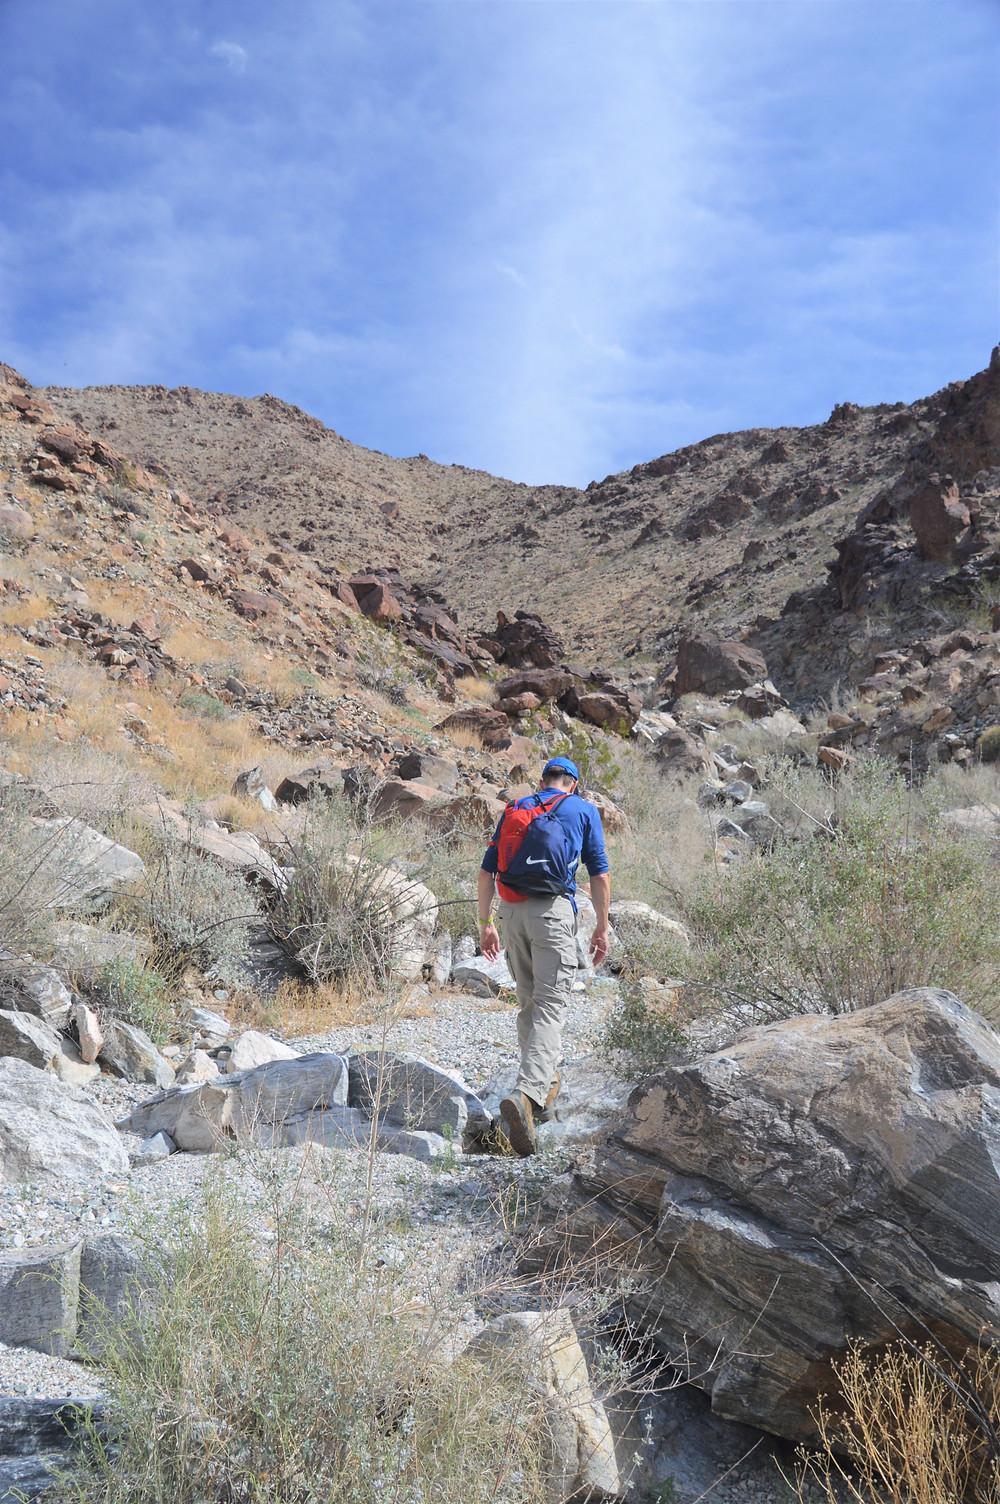 Hiking through wash on way to Pinto Mountain summit in Joshua Tree National Park